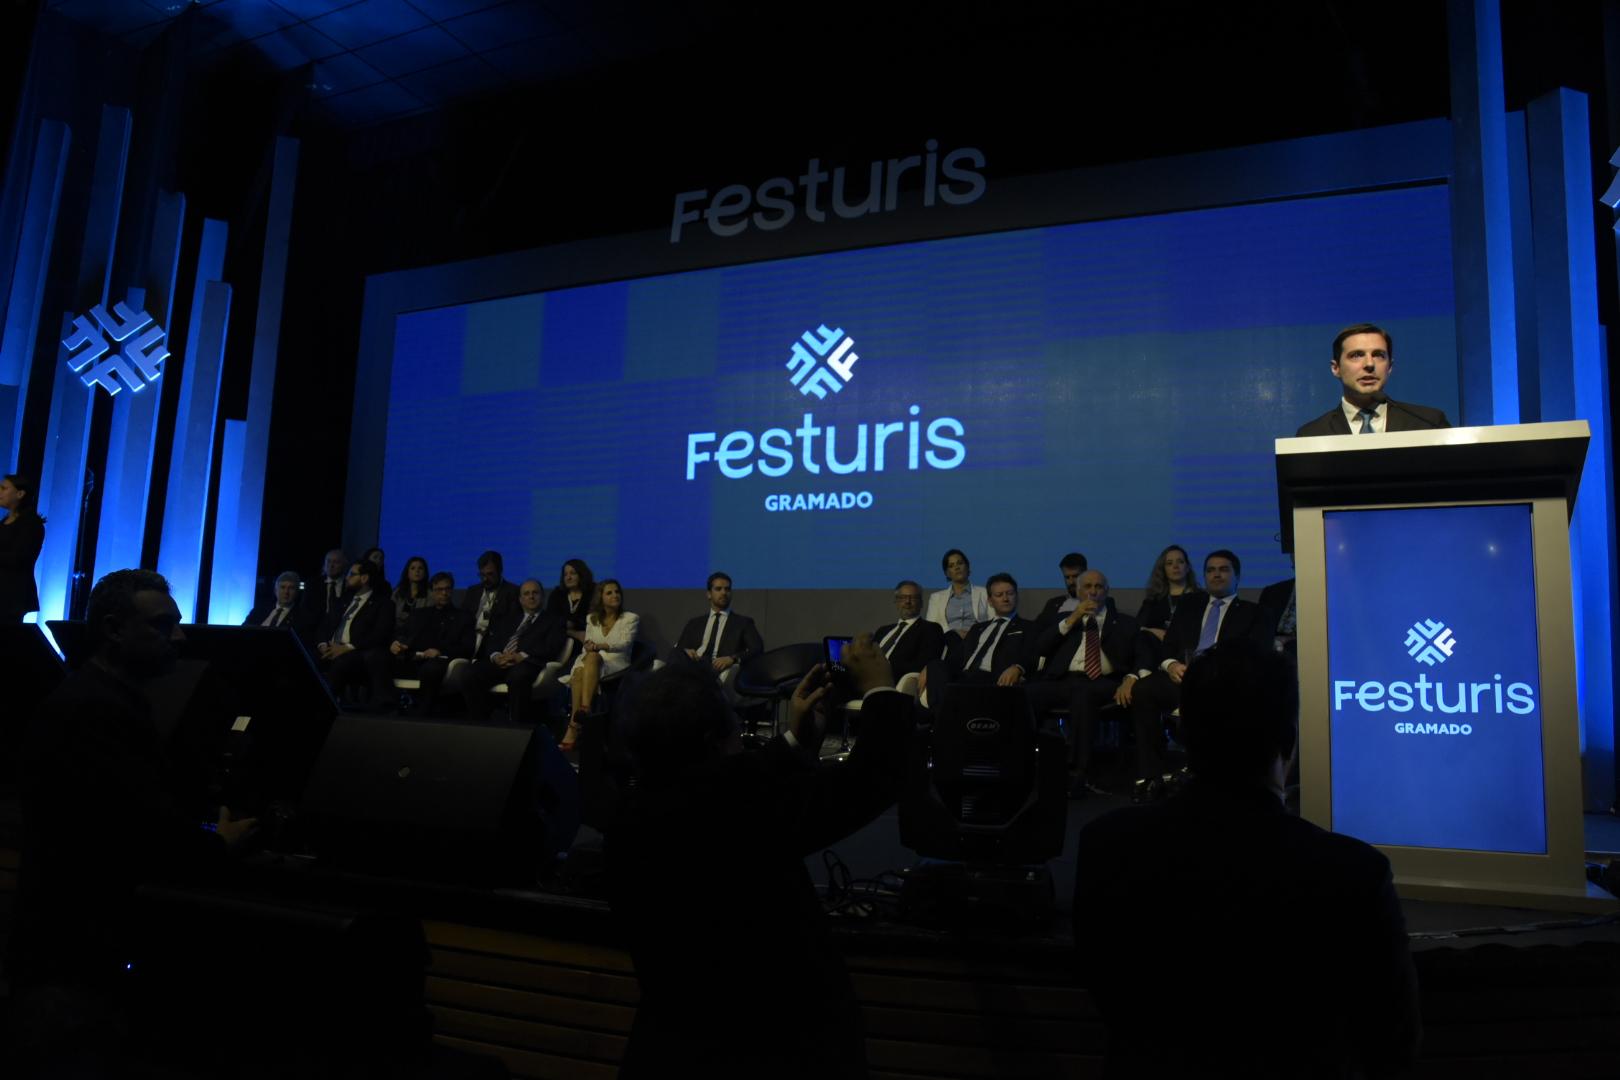 FESTURIS ABERTURA 2.JPG